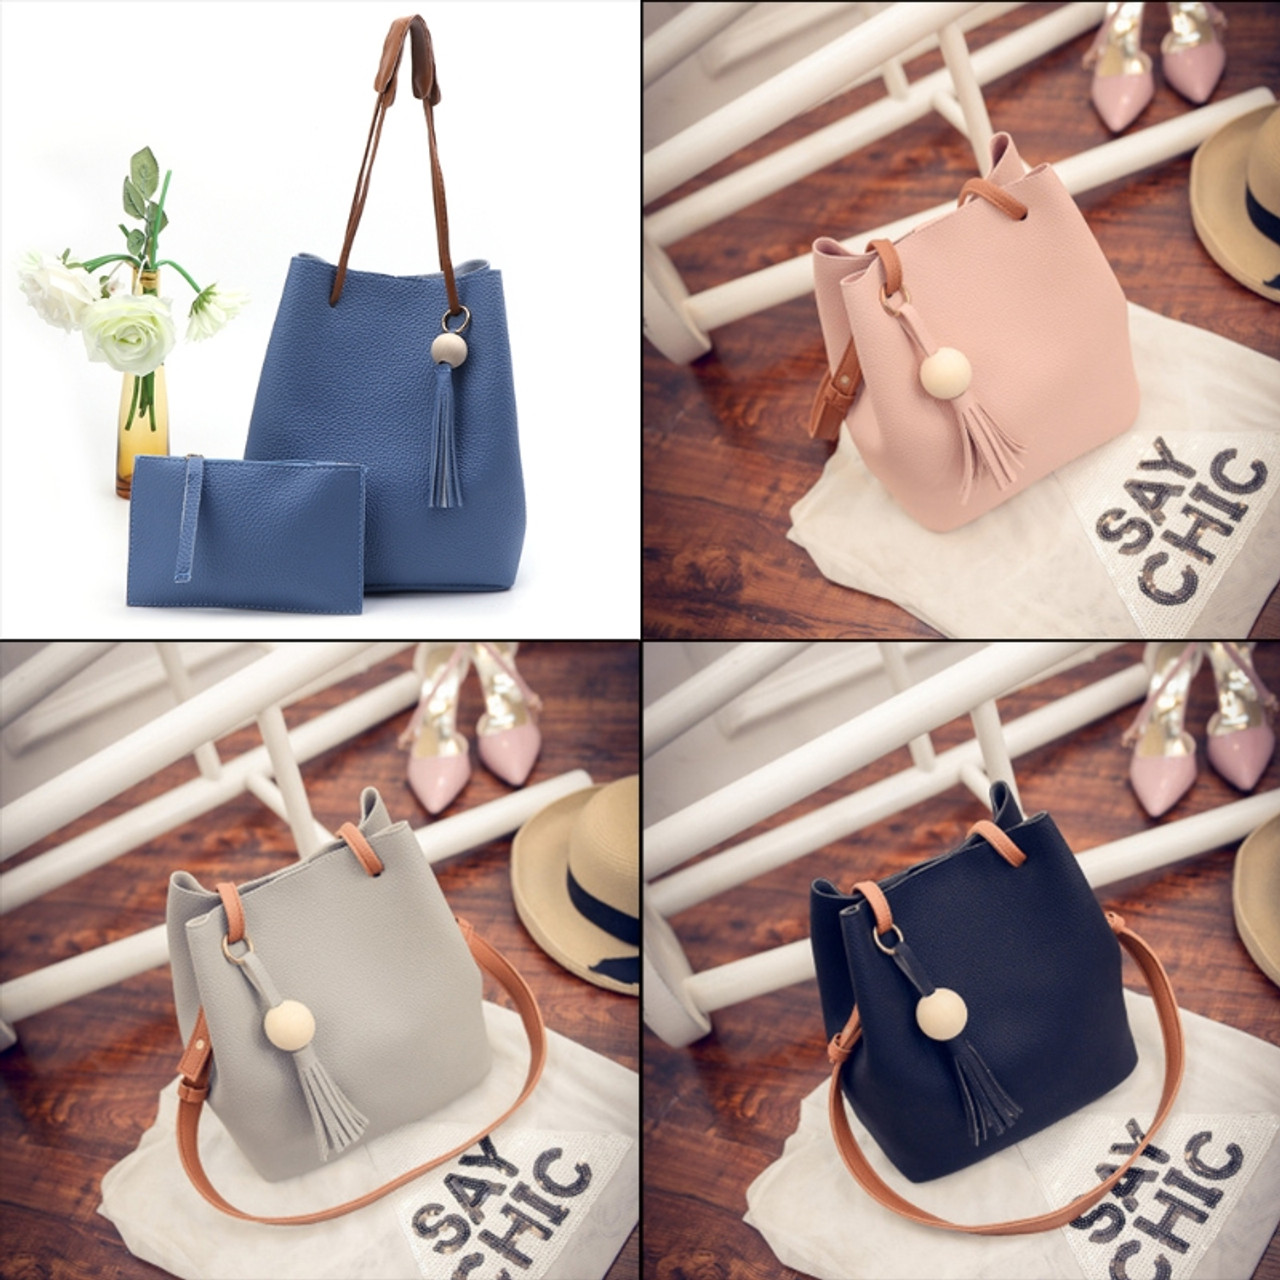 1a1a9c1b6570 ... THINKTHENDO New 2pcs Women Leather Handbag Fashion Crossbody Bags  Shoulder Bag Tote Small Purse Messenger Clutch ...